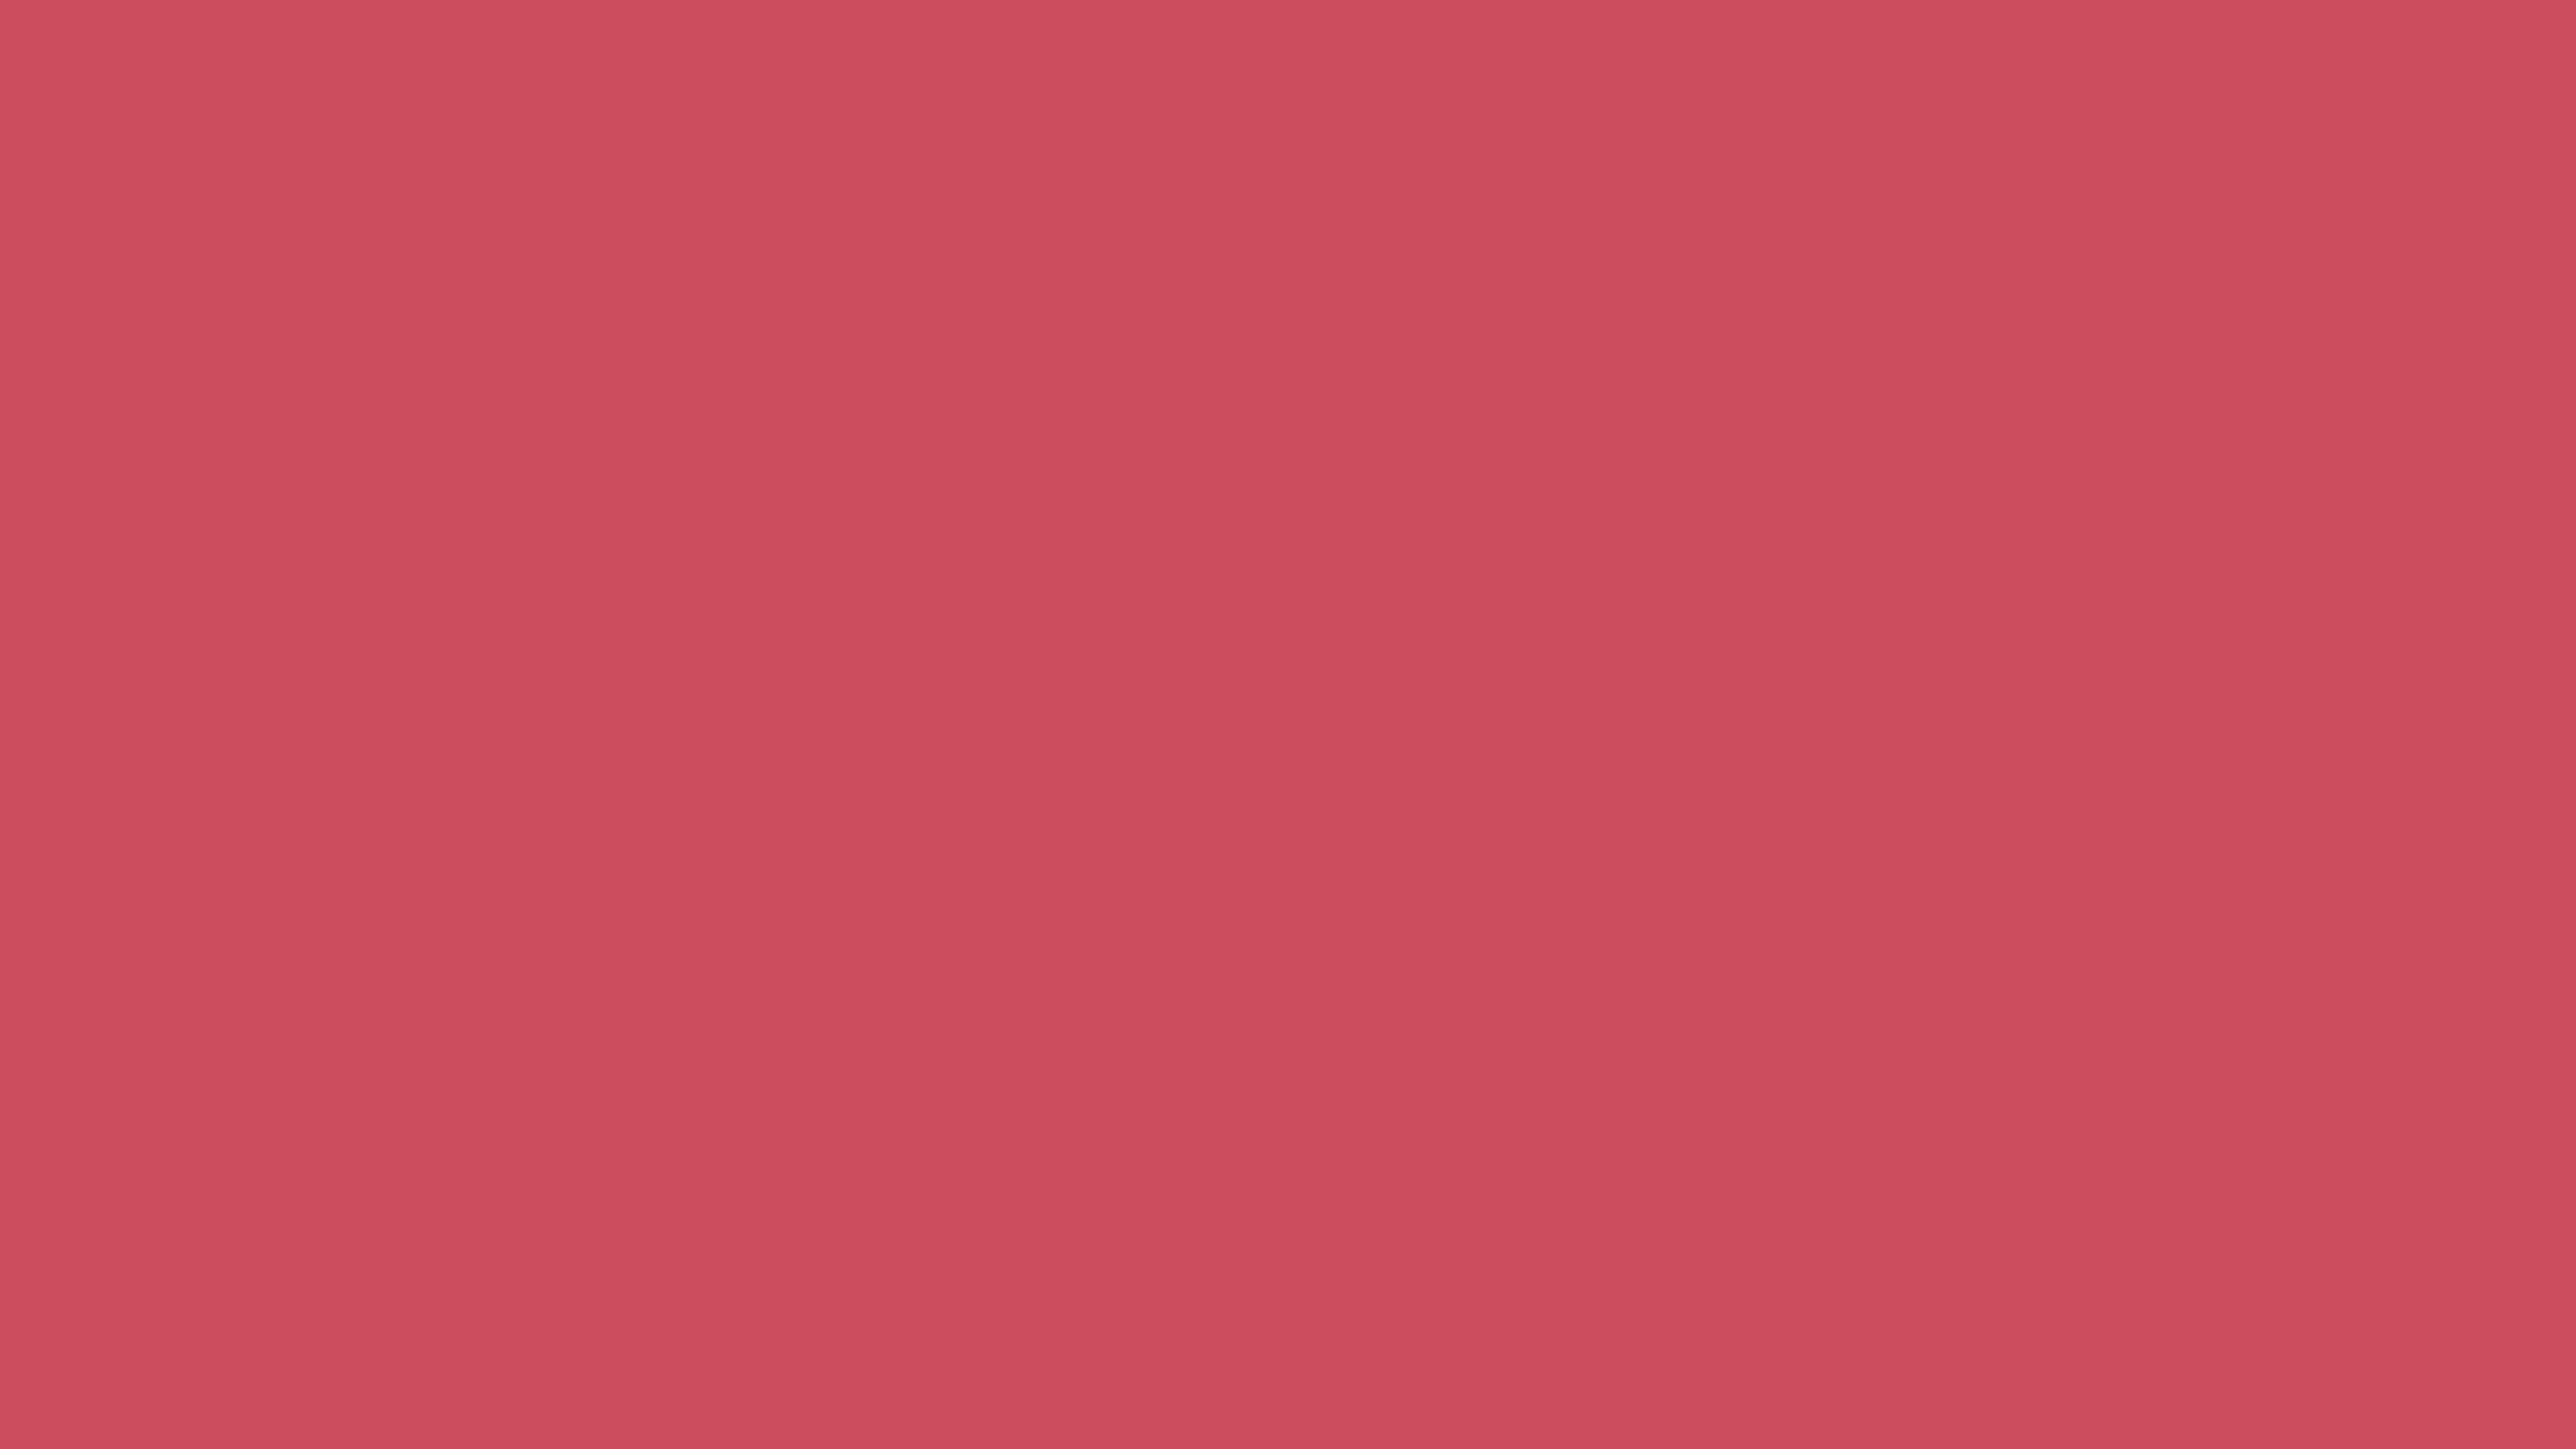 4096x2304 Dark Terra Cotta Solid Color Background